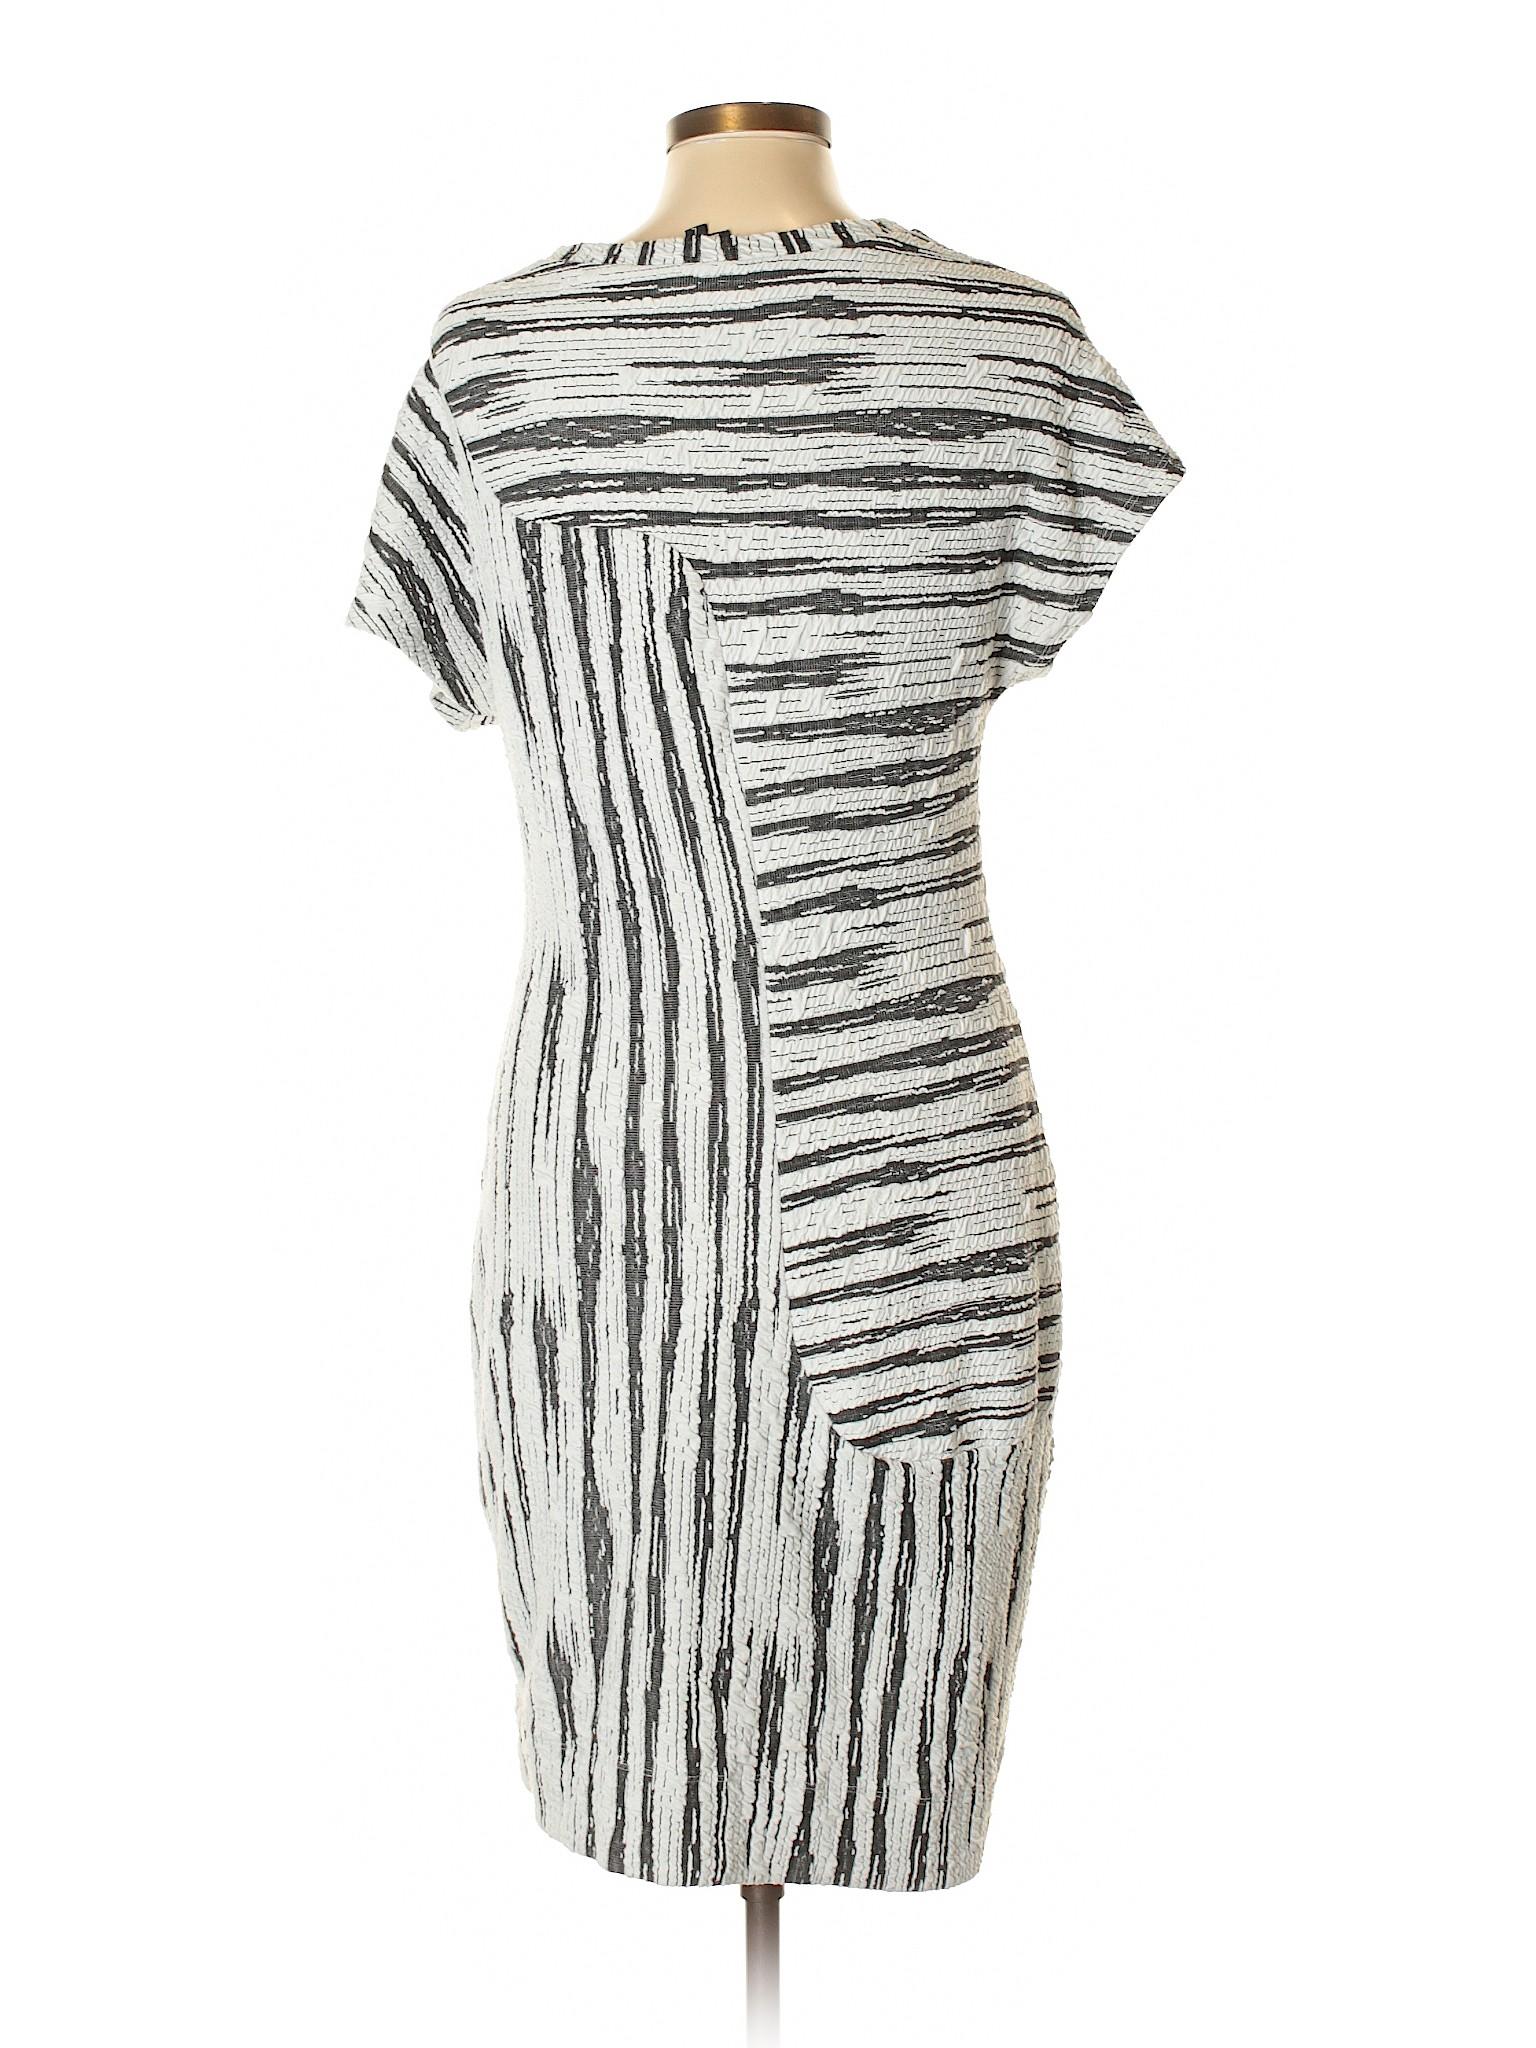 Casual Liberty Love Dress Selling amp; wqXR7THx